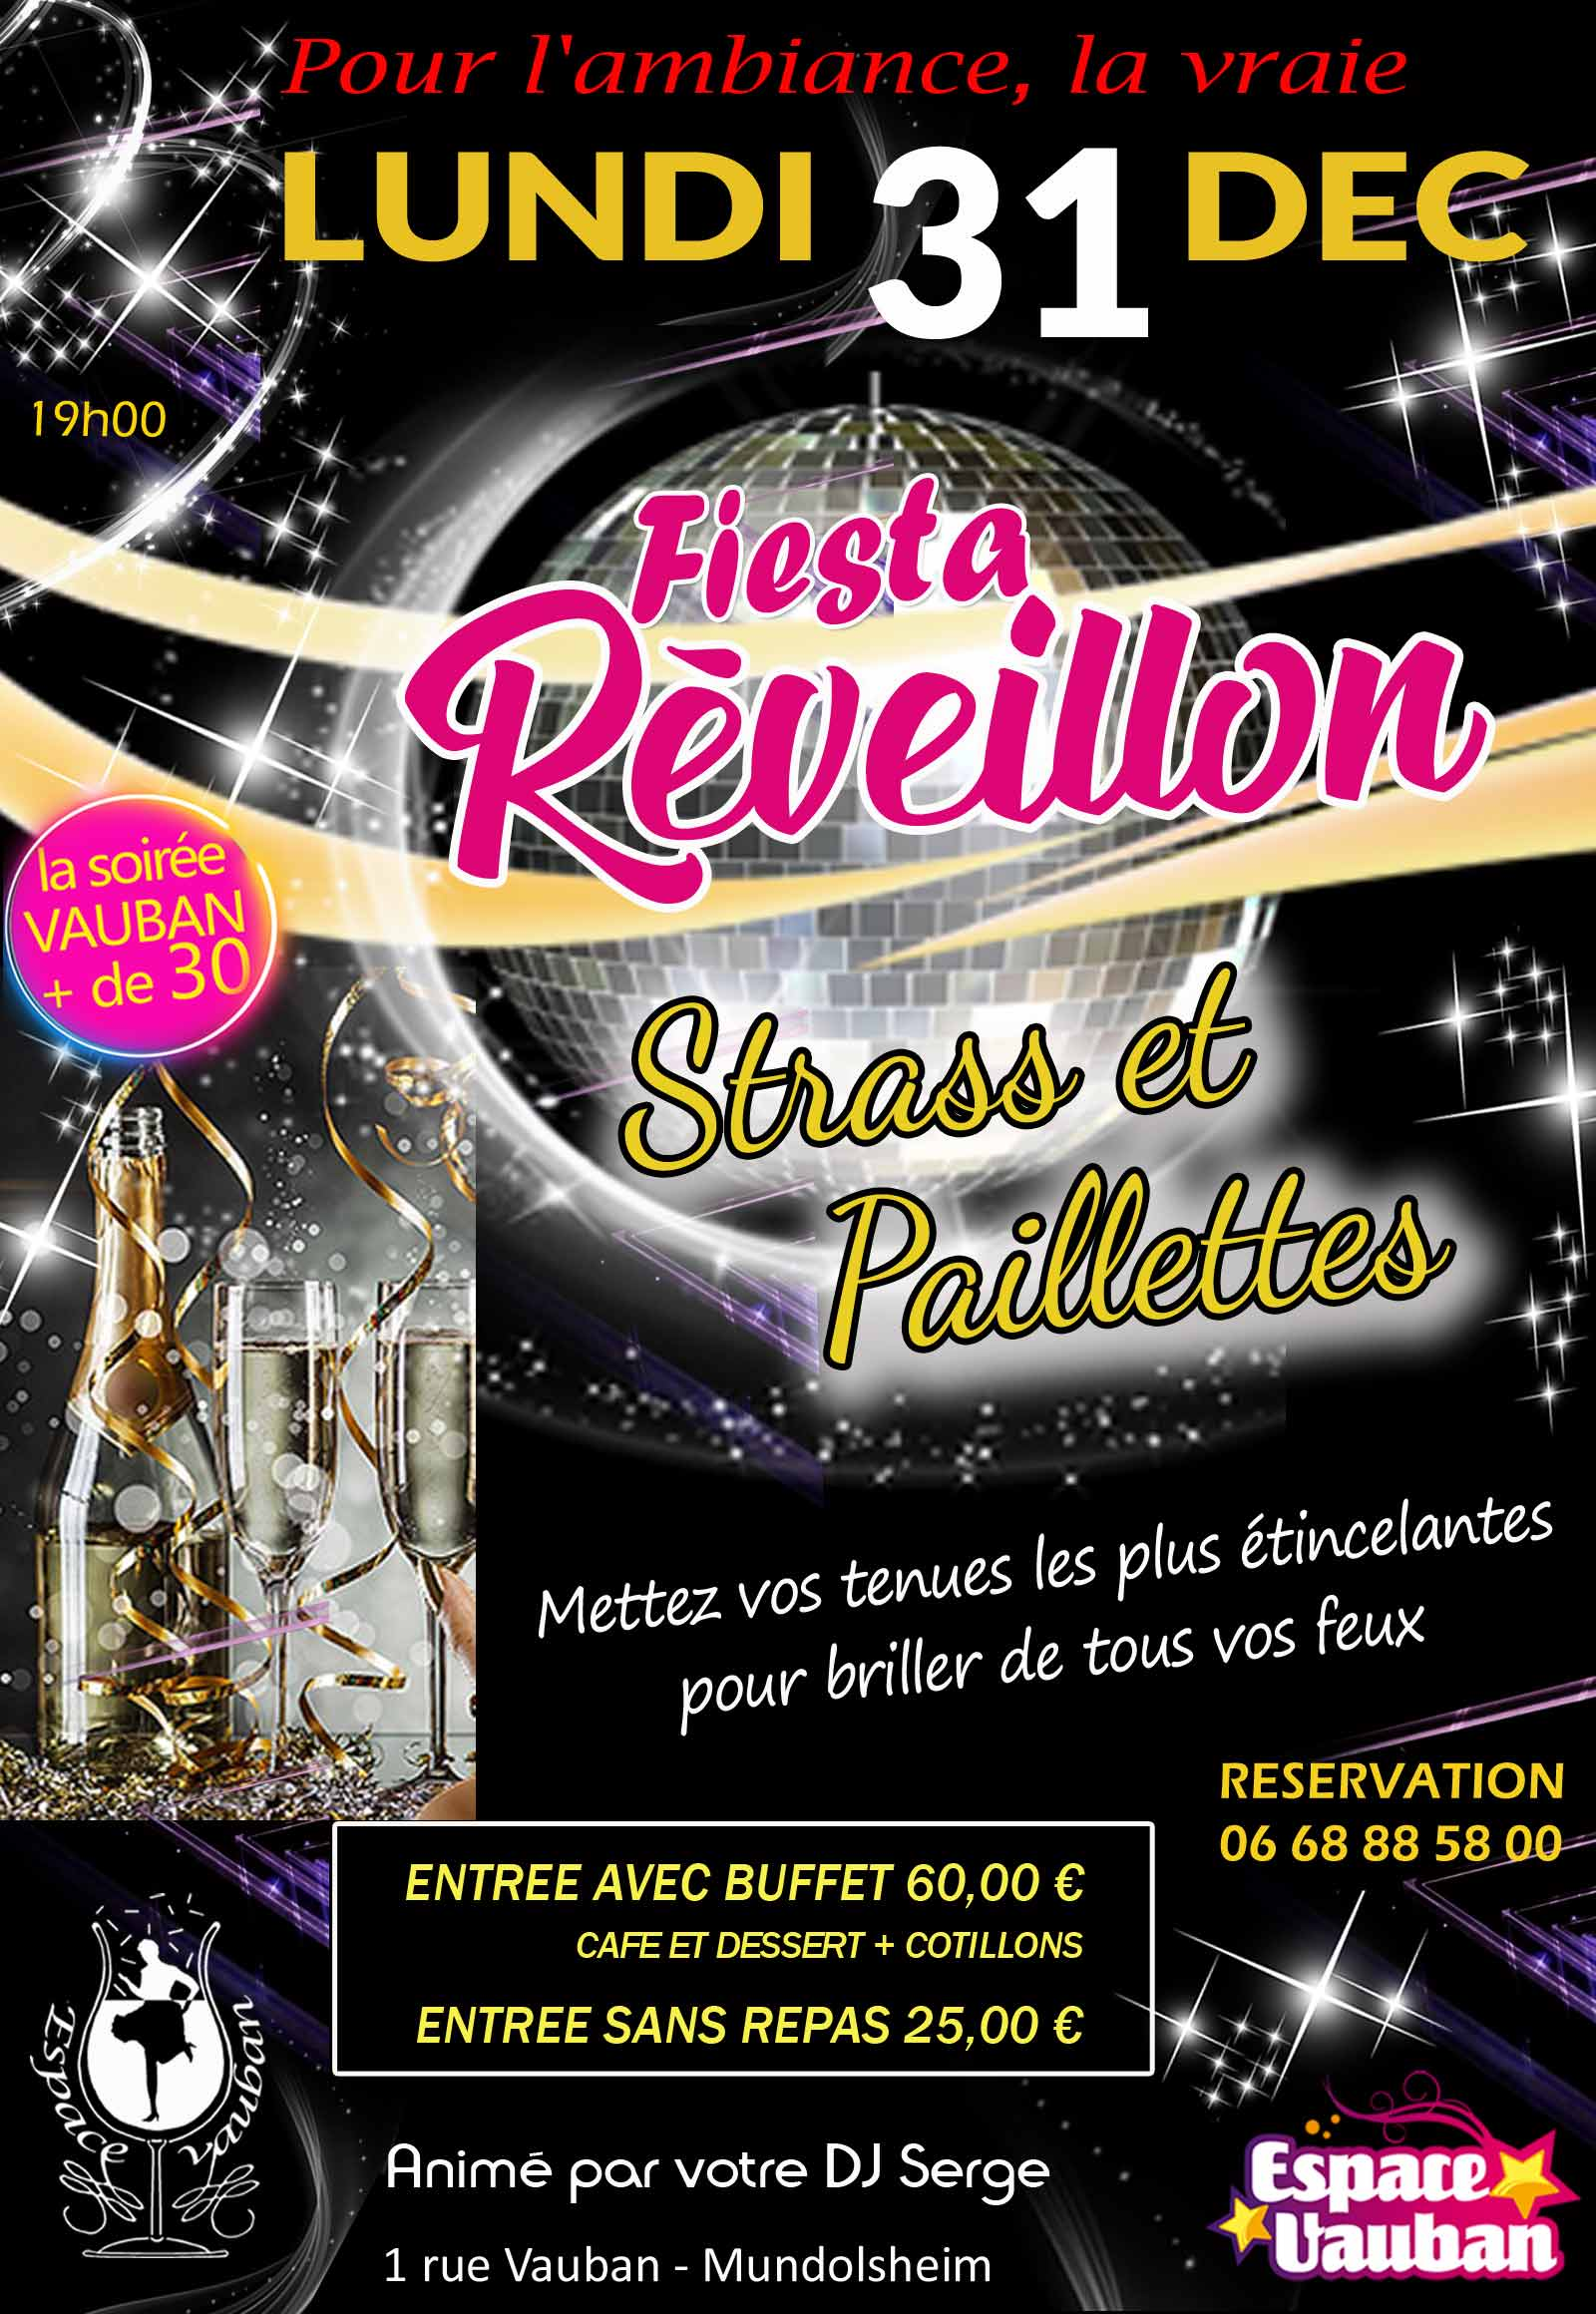 64f03a076c3 ☆ Fiesta Réveillon ☆ Strass et Paillettes ☆ – ESPACE VAUBAN